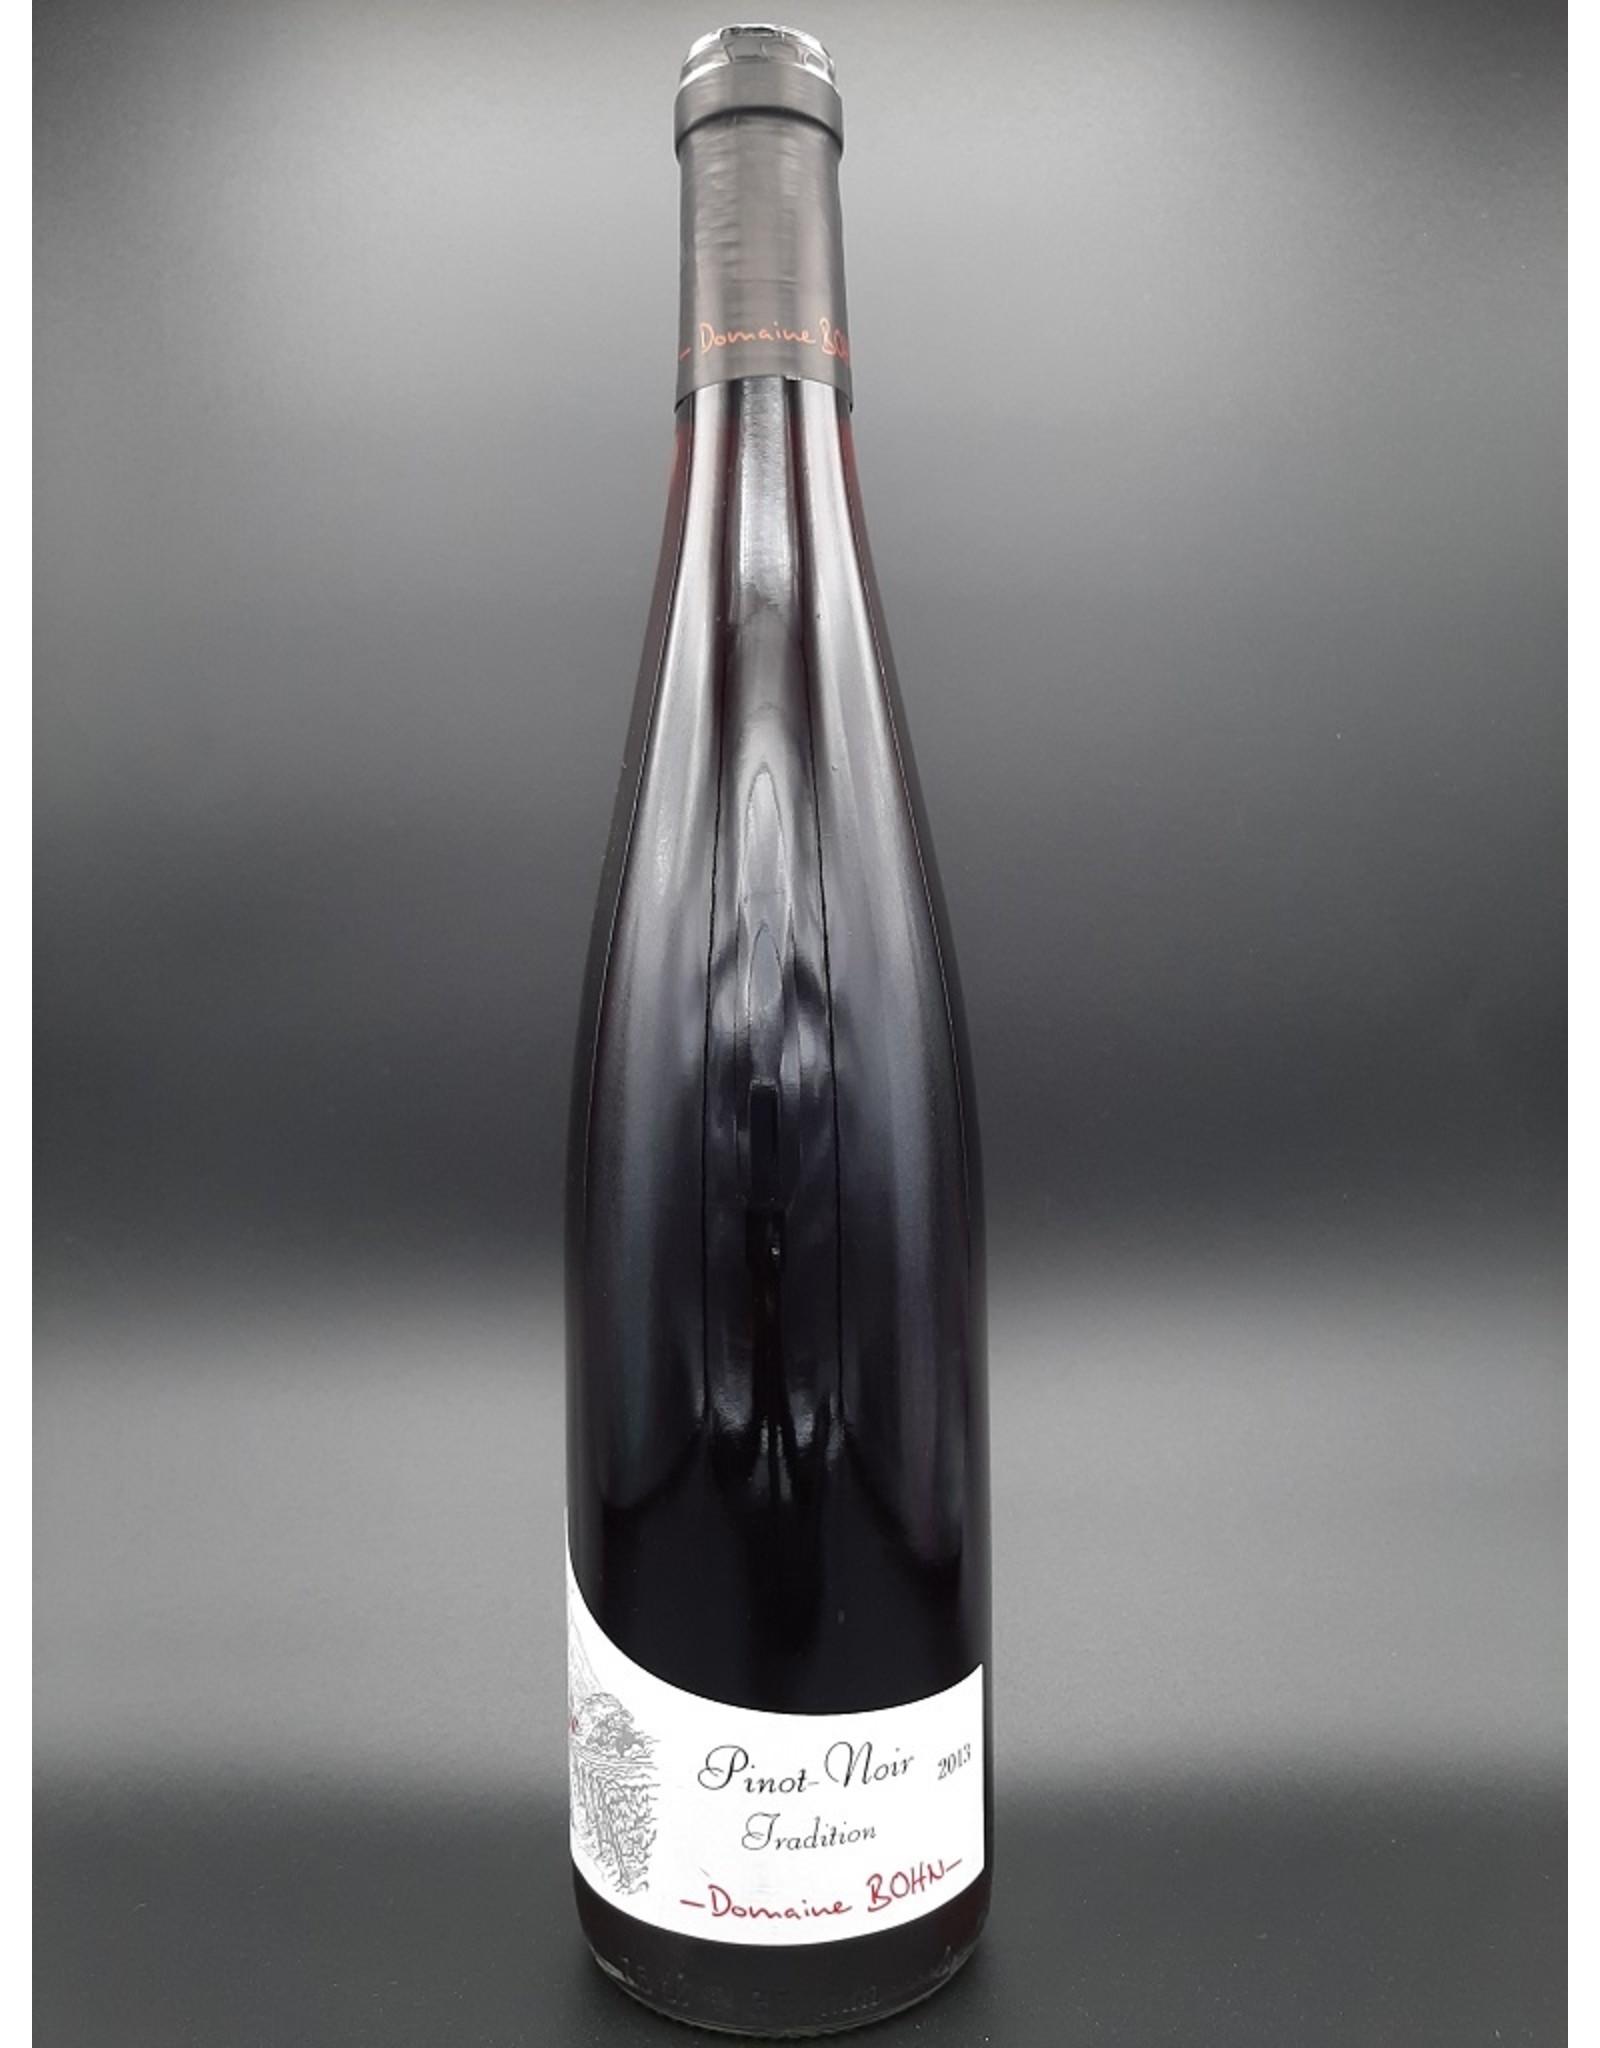 Domaine Bohn Pinot Noir Tradition 2016